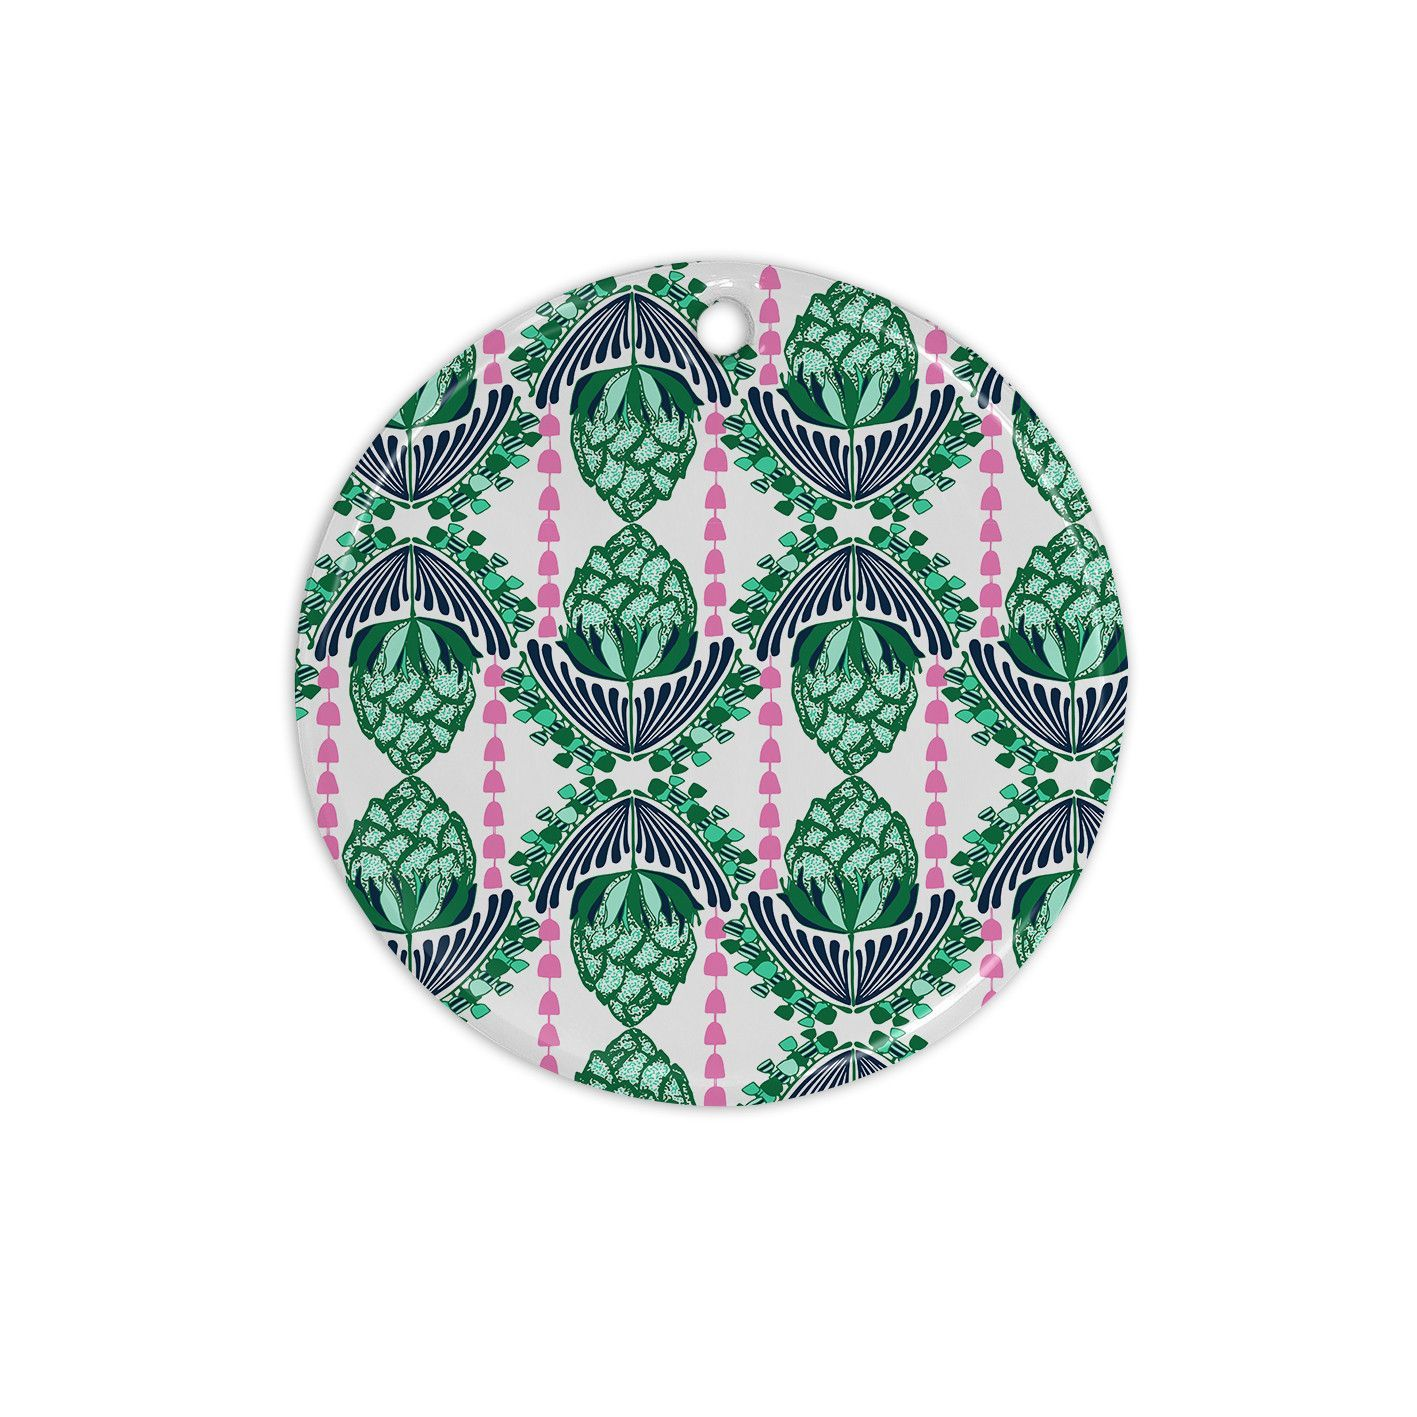 "Amy Reber ""Tassles"" Green Line Illustration Ceramic Circle Ornament"